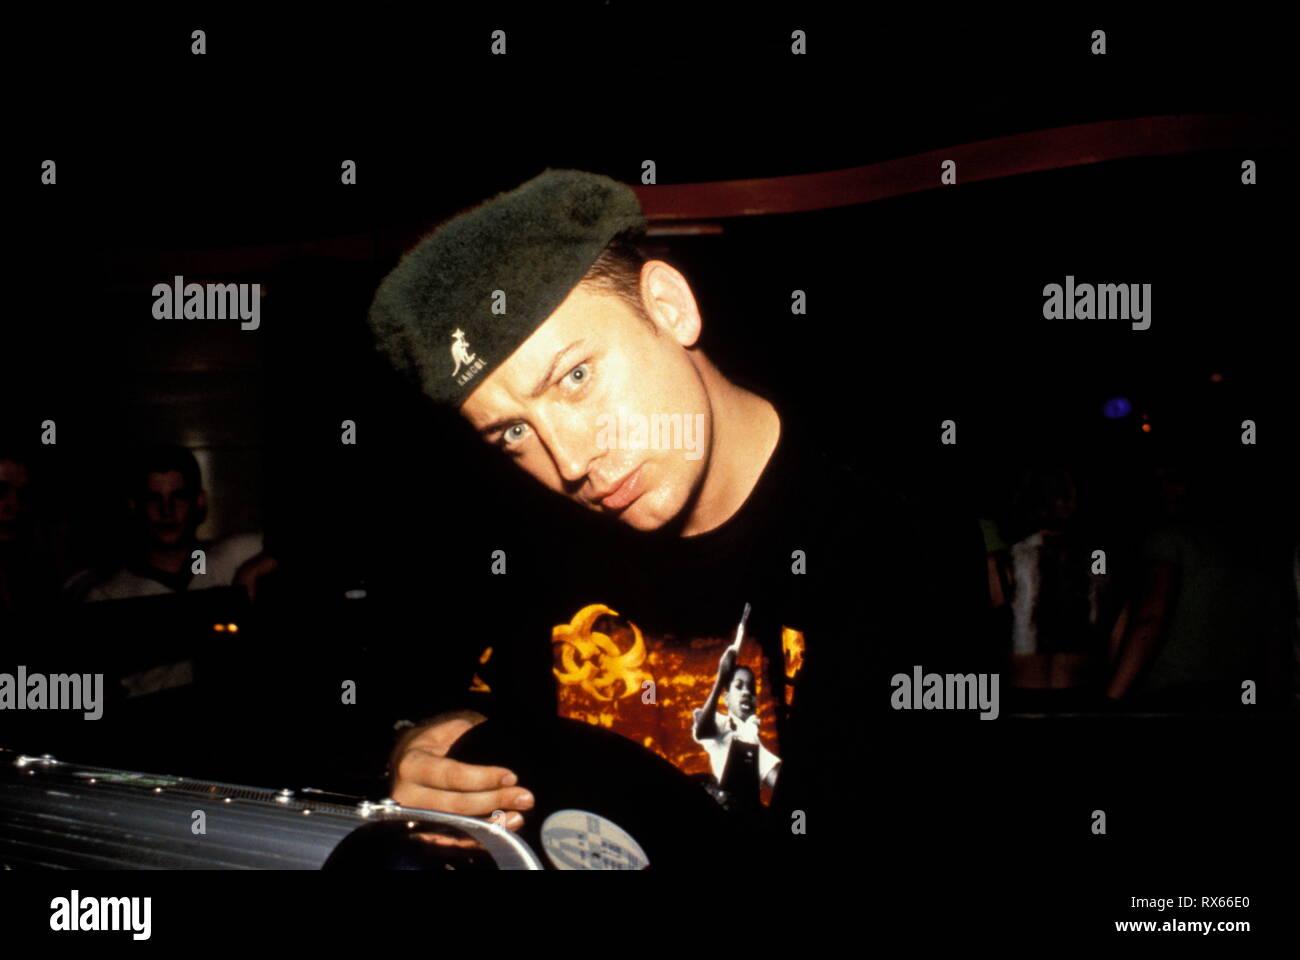 Boy George DJing at The Wheel, B.G. Birmingham, U.K, 1996. - Stock Image